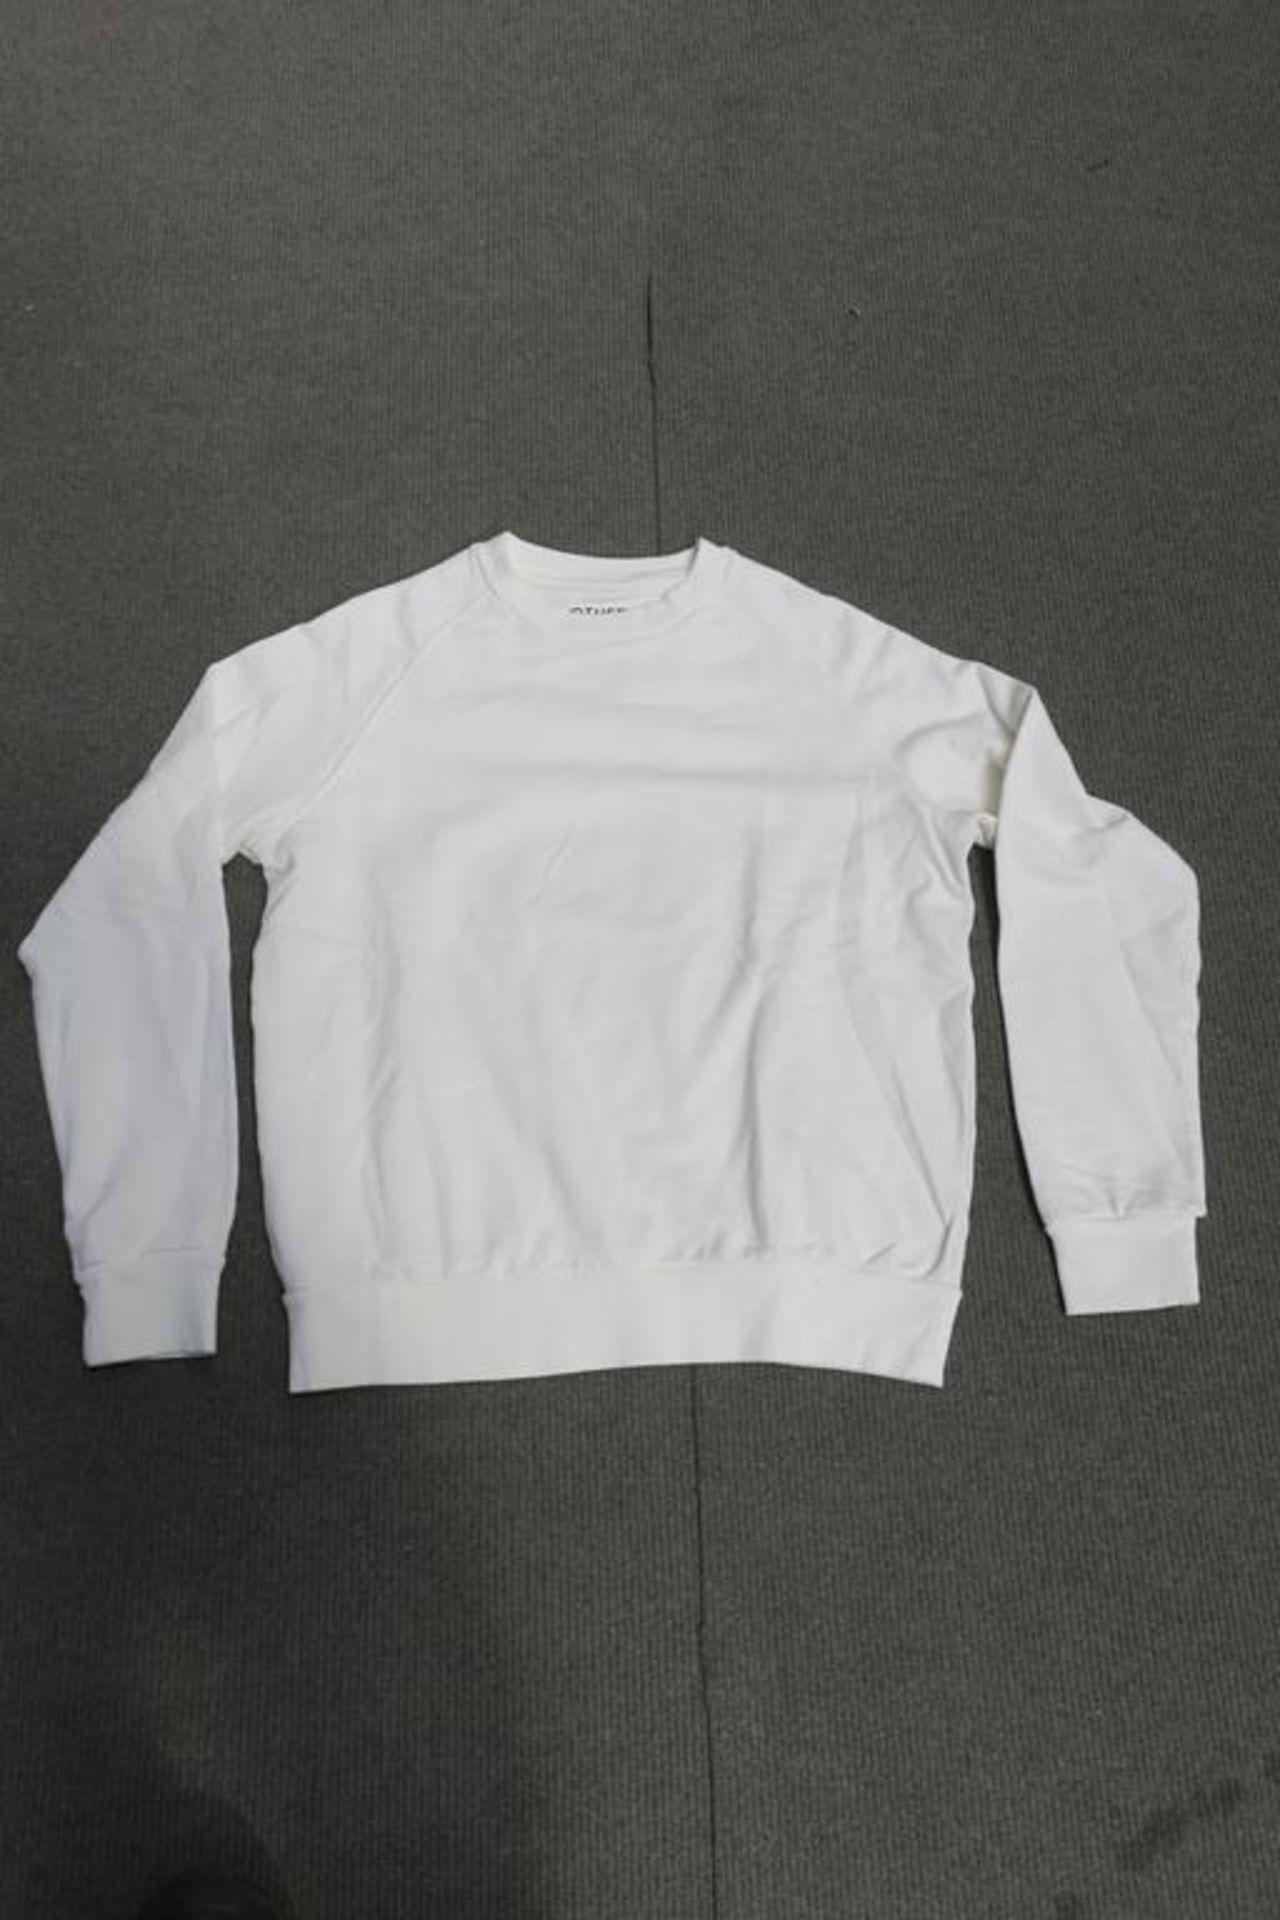 Lot 741 - 8 Other Ragian Sweatshirts Long Sleeved, Colour Ecru, 3 x XL, 3 x Med, 2 x Small